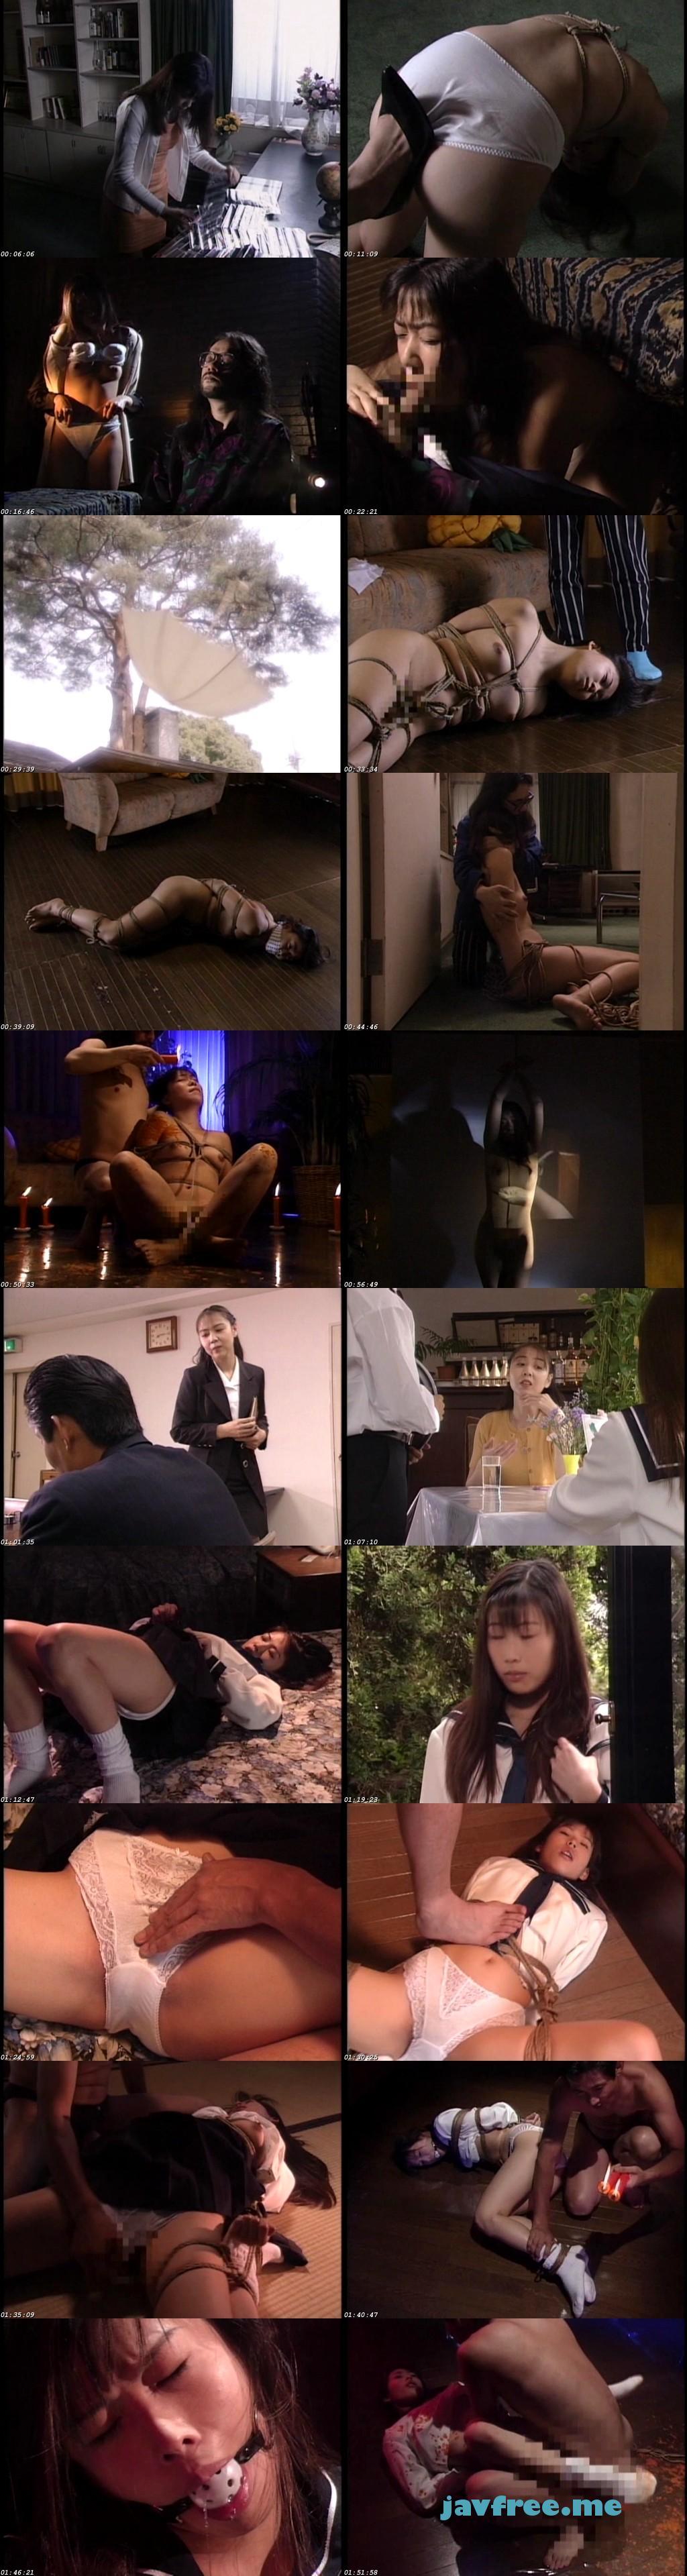 [CMA 001] インモラル天使セレクション 水島千彰 小川流菜 姫ゆり CMA